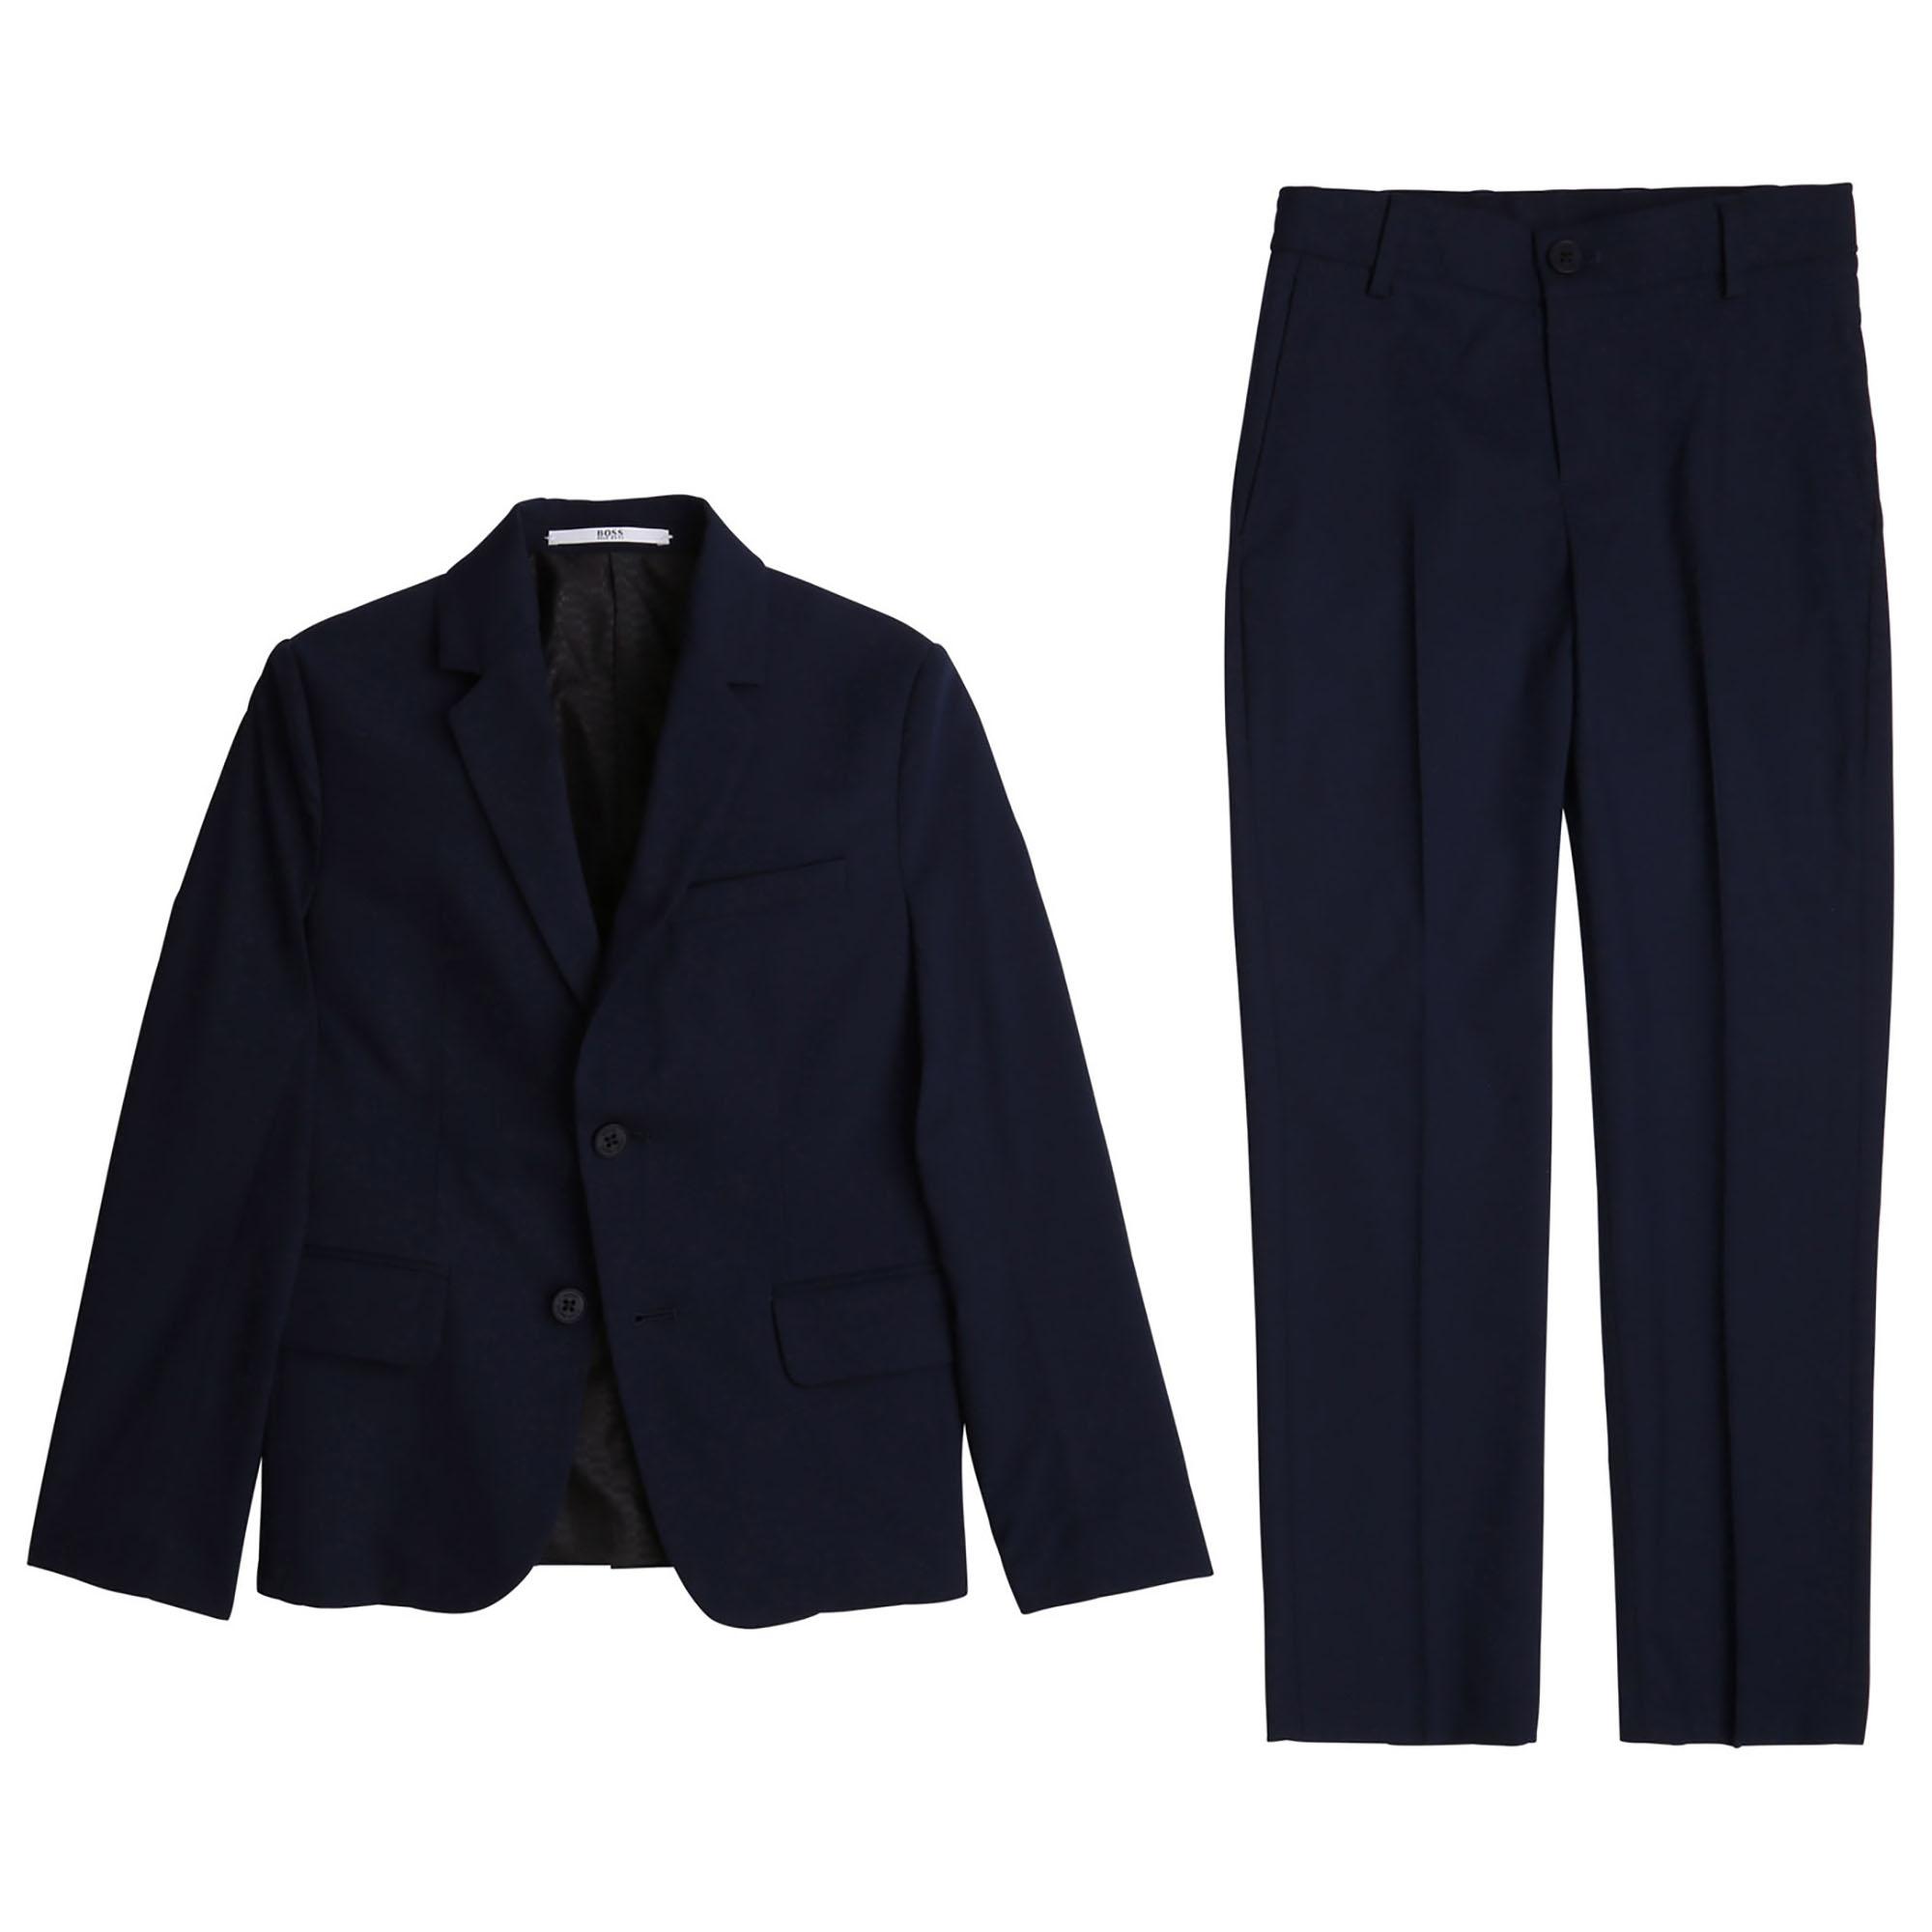 Jacket + pants set BOSS for BOY